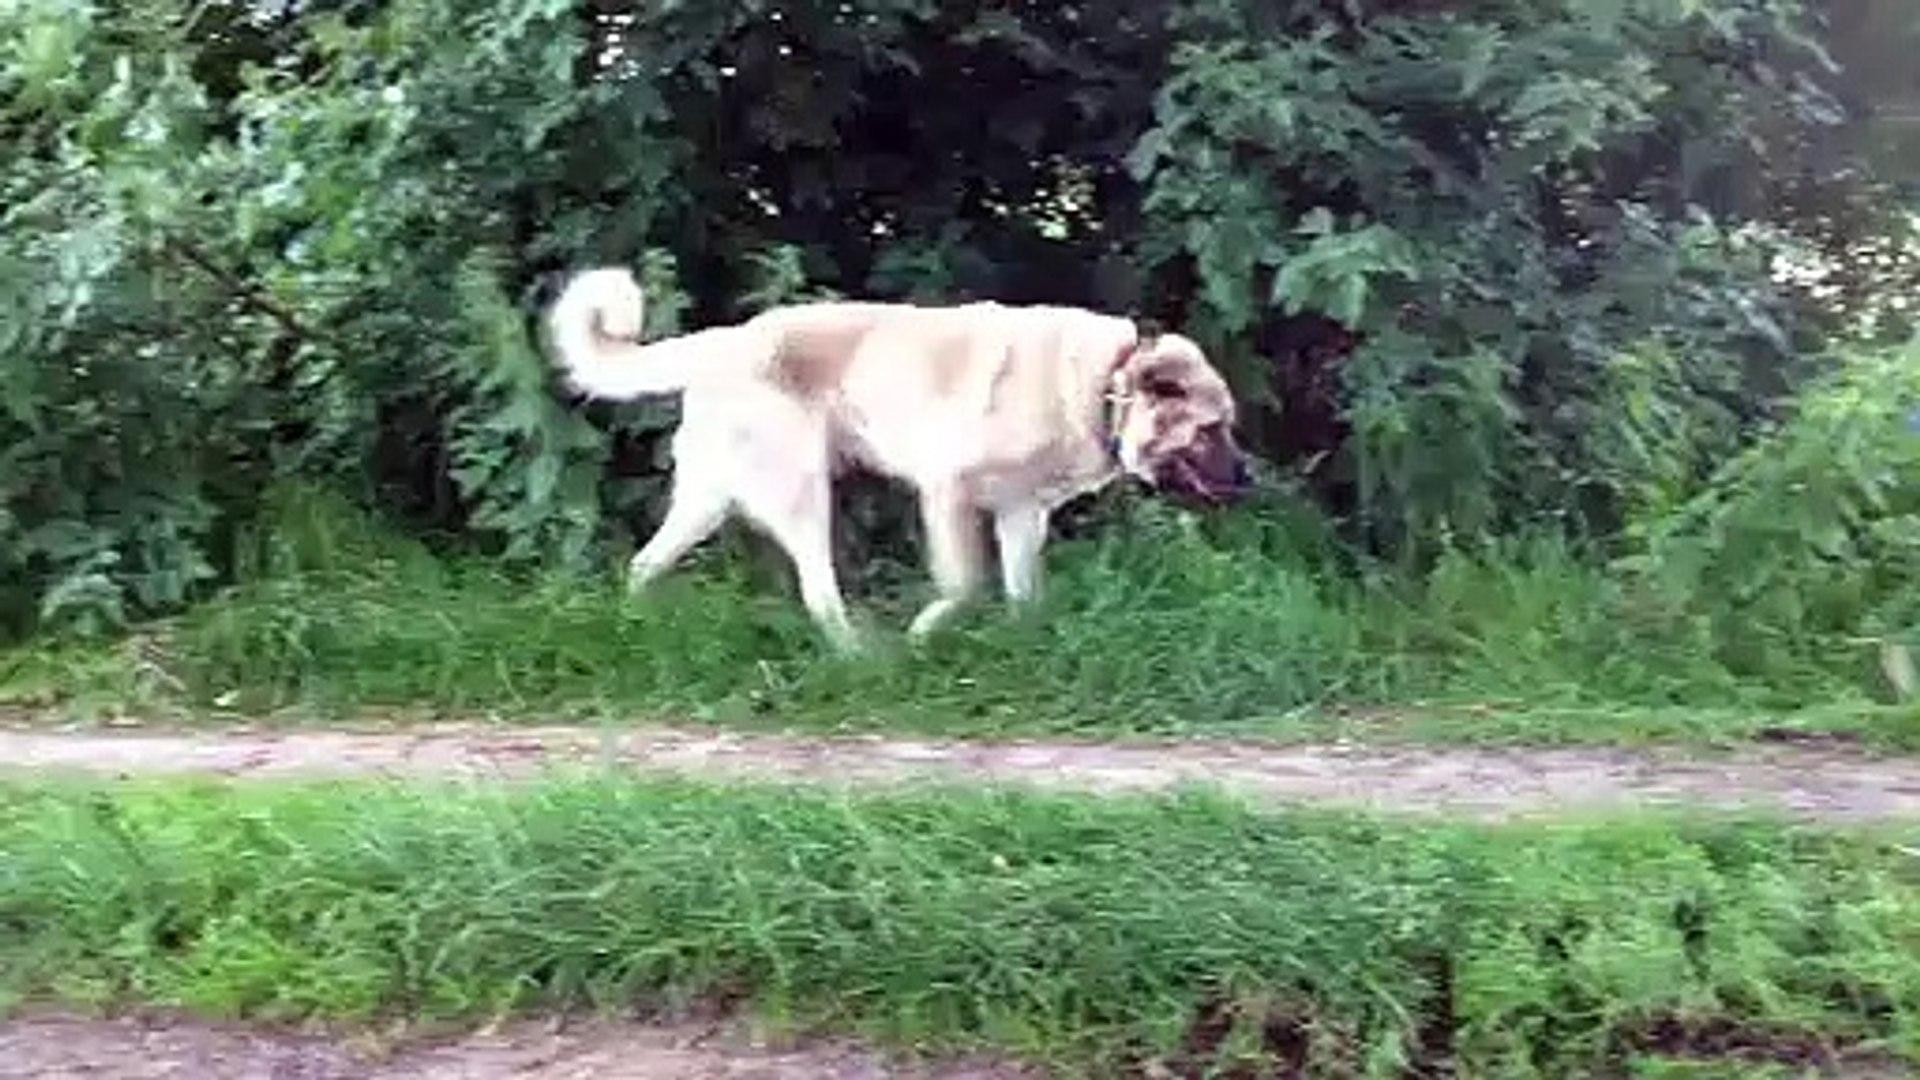 DEV COBAN KOPEGi ve SAHiBi YURUYUS - GiANT SHEPHERD DOG with WALK